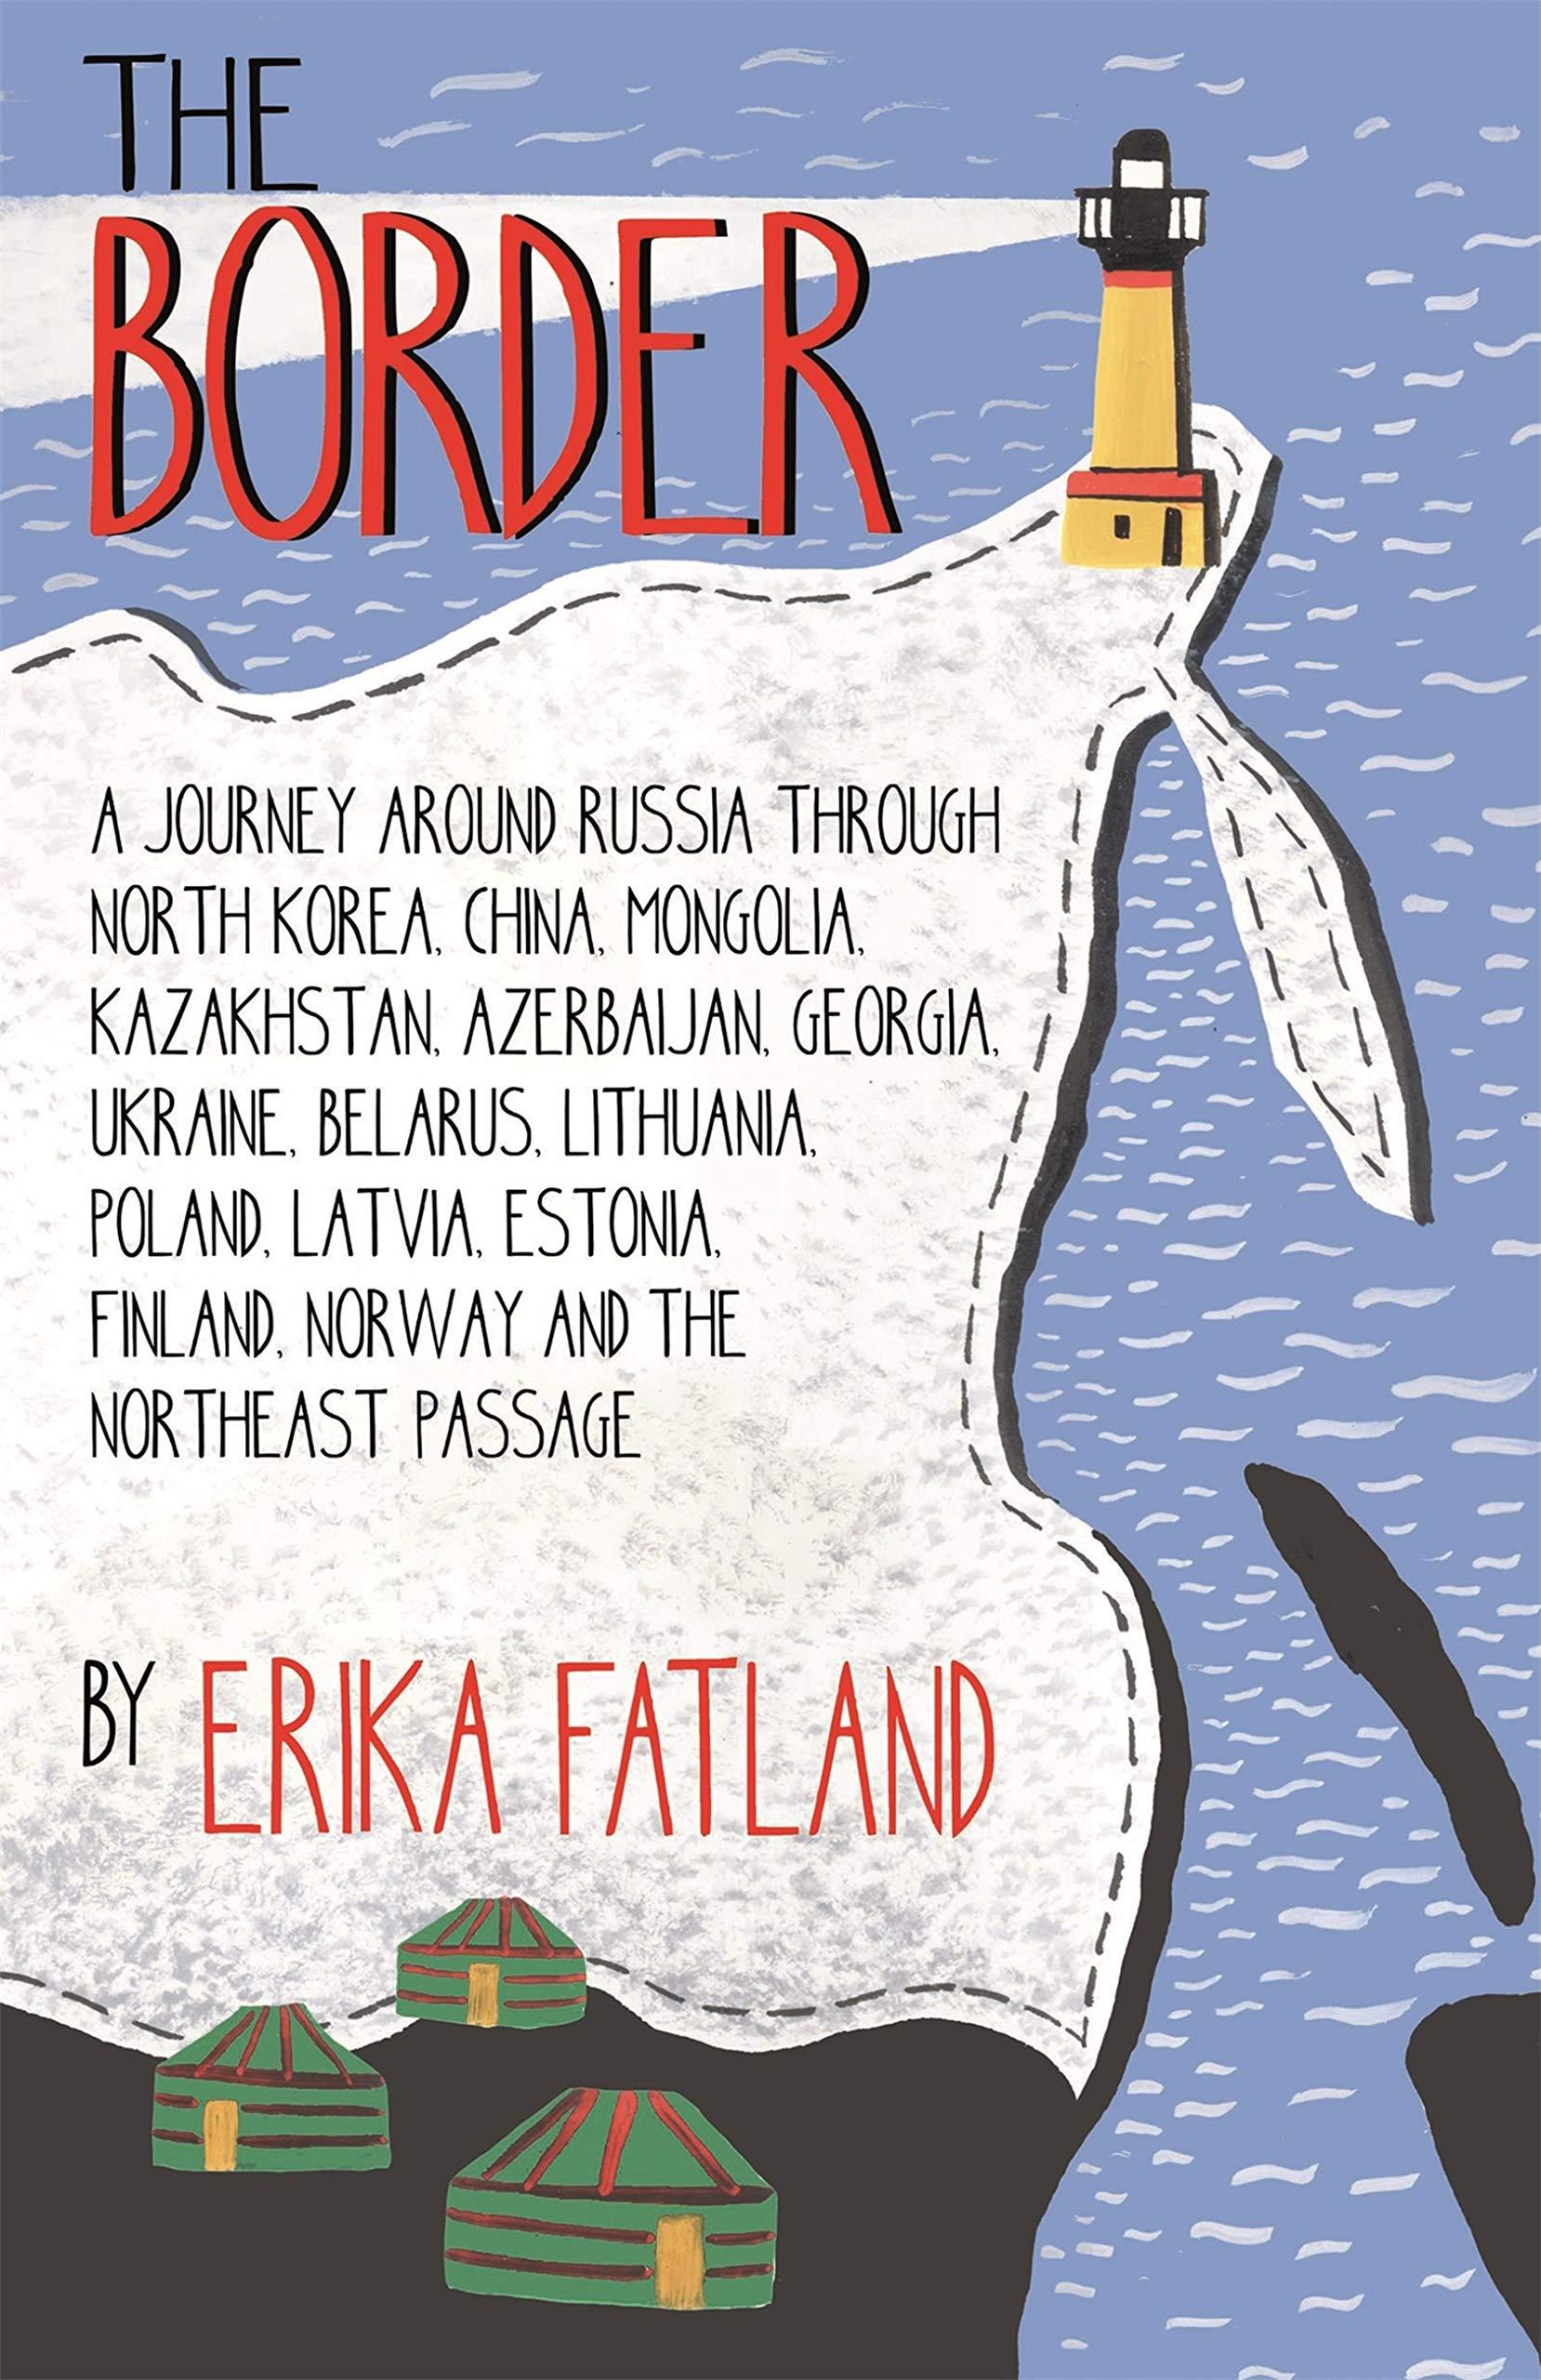 The Border - A Journey Around Russia: Through North Korea, China, Mongolia, Kazakhstan, Azerbaijan, Georgia, Ukraine, Belarus, Lithuania, Poland, Latvia, ... Finland, Norway and the Northeast Passage